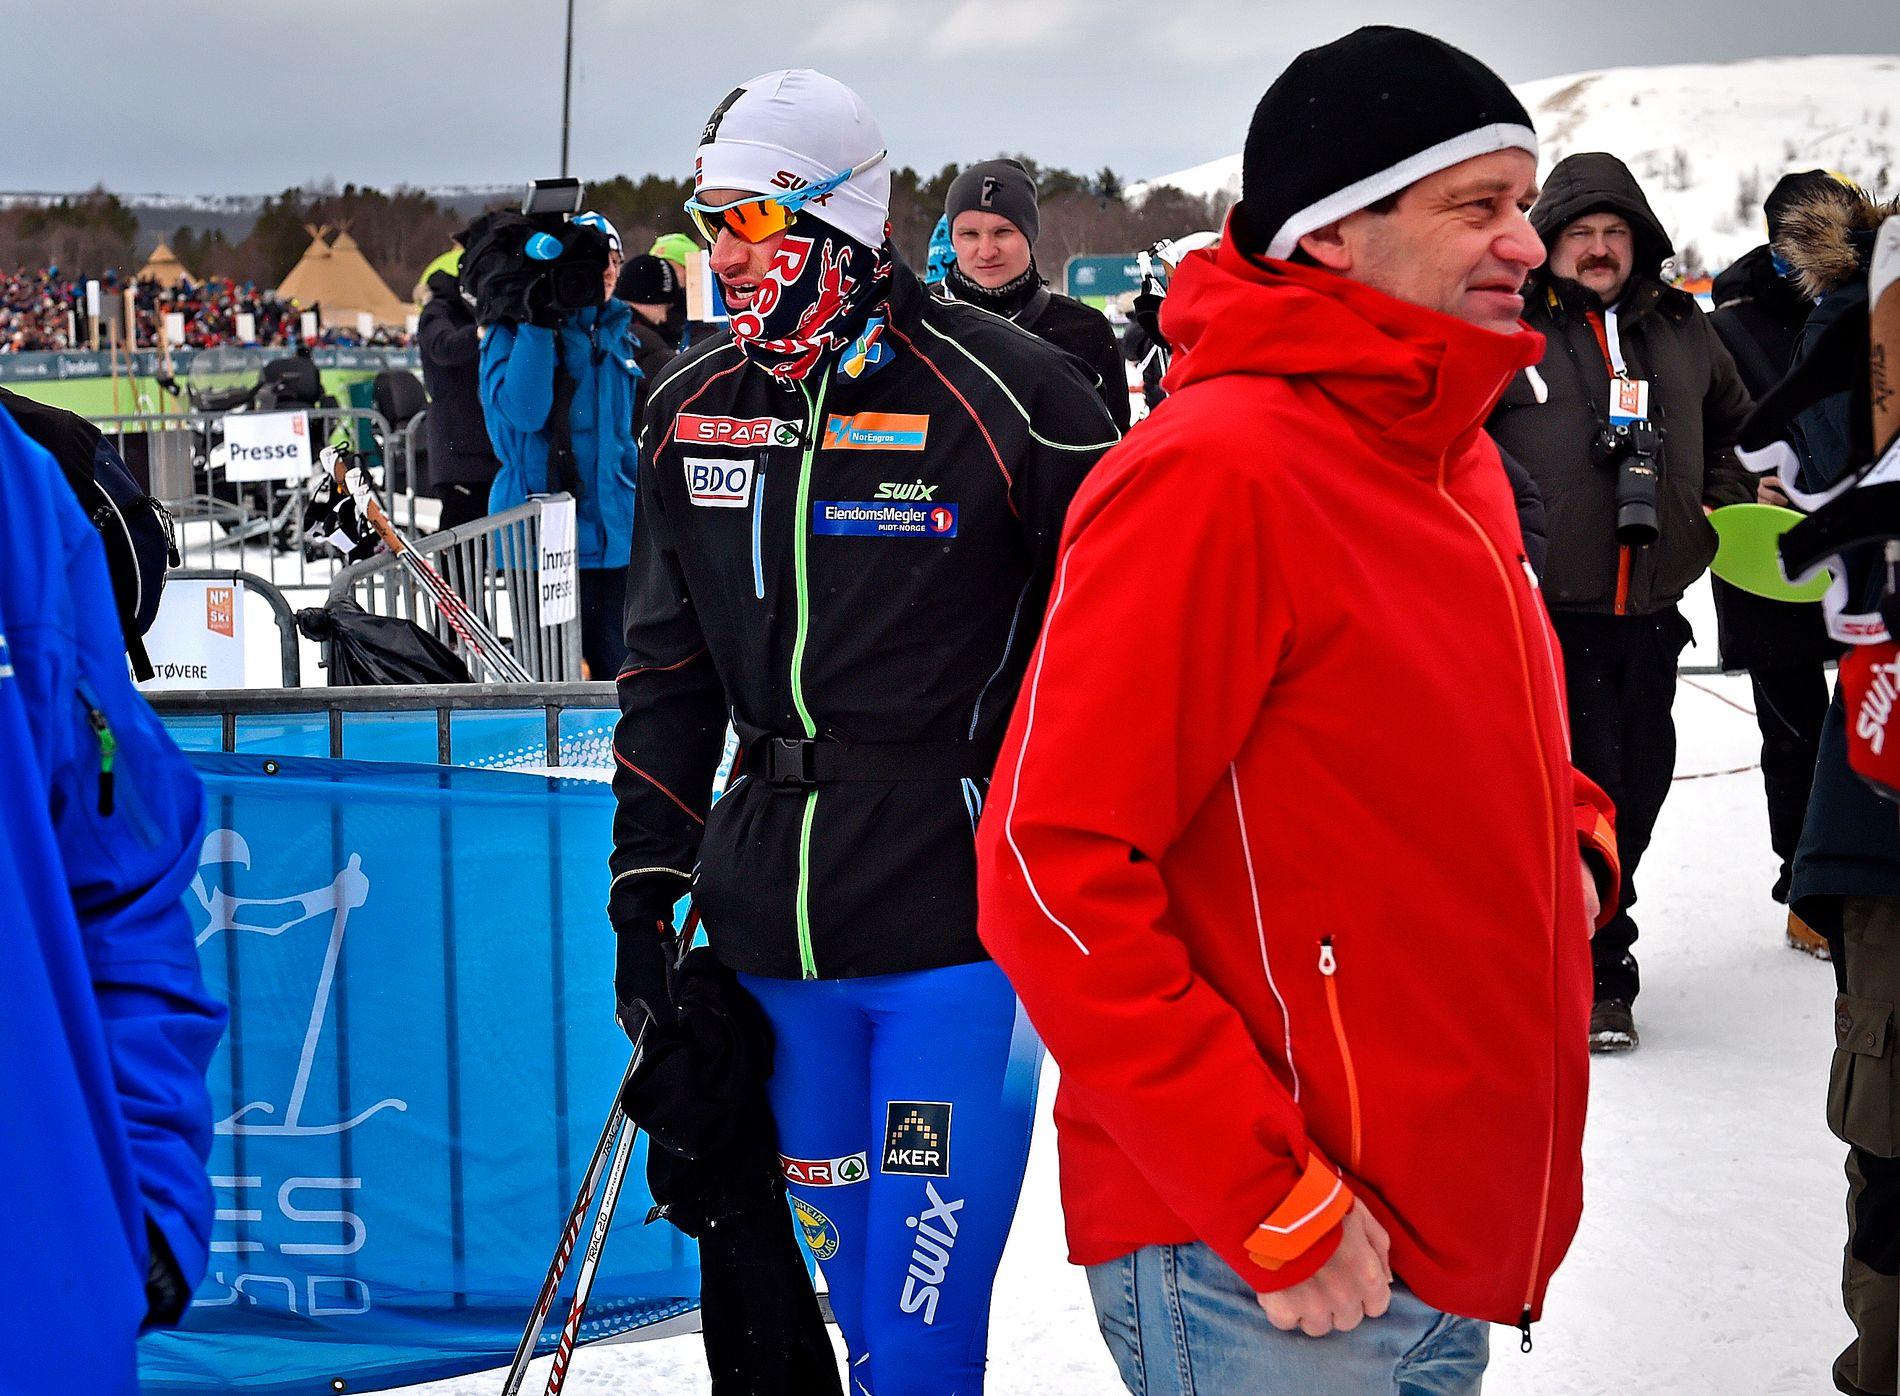 EKSPERT: Torgeir Bjørn ute i felten under NM på ski i 2015. Petter Northug passerer.